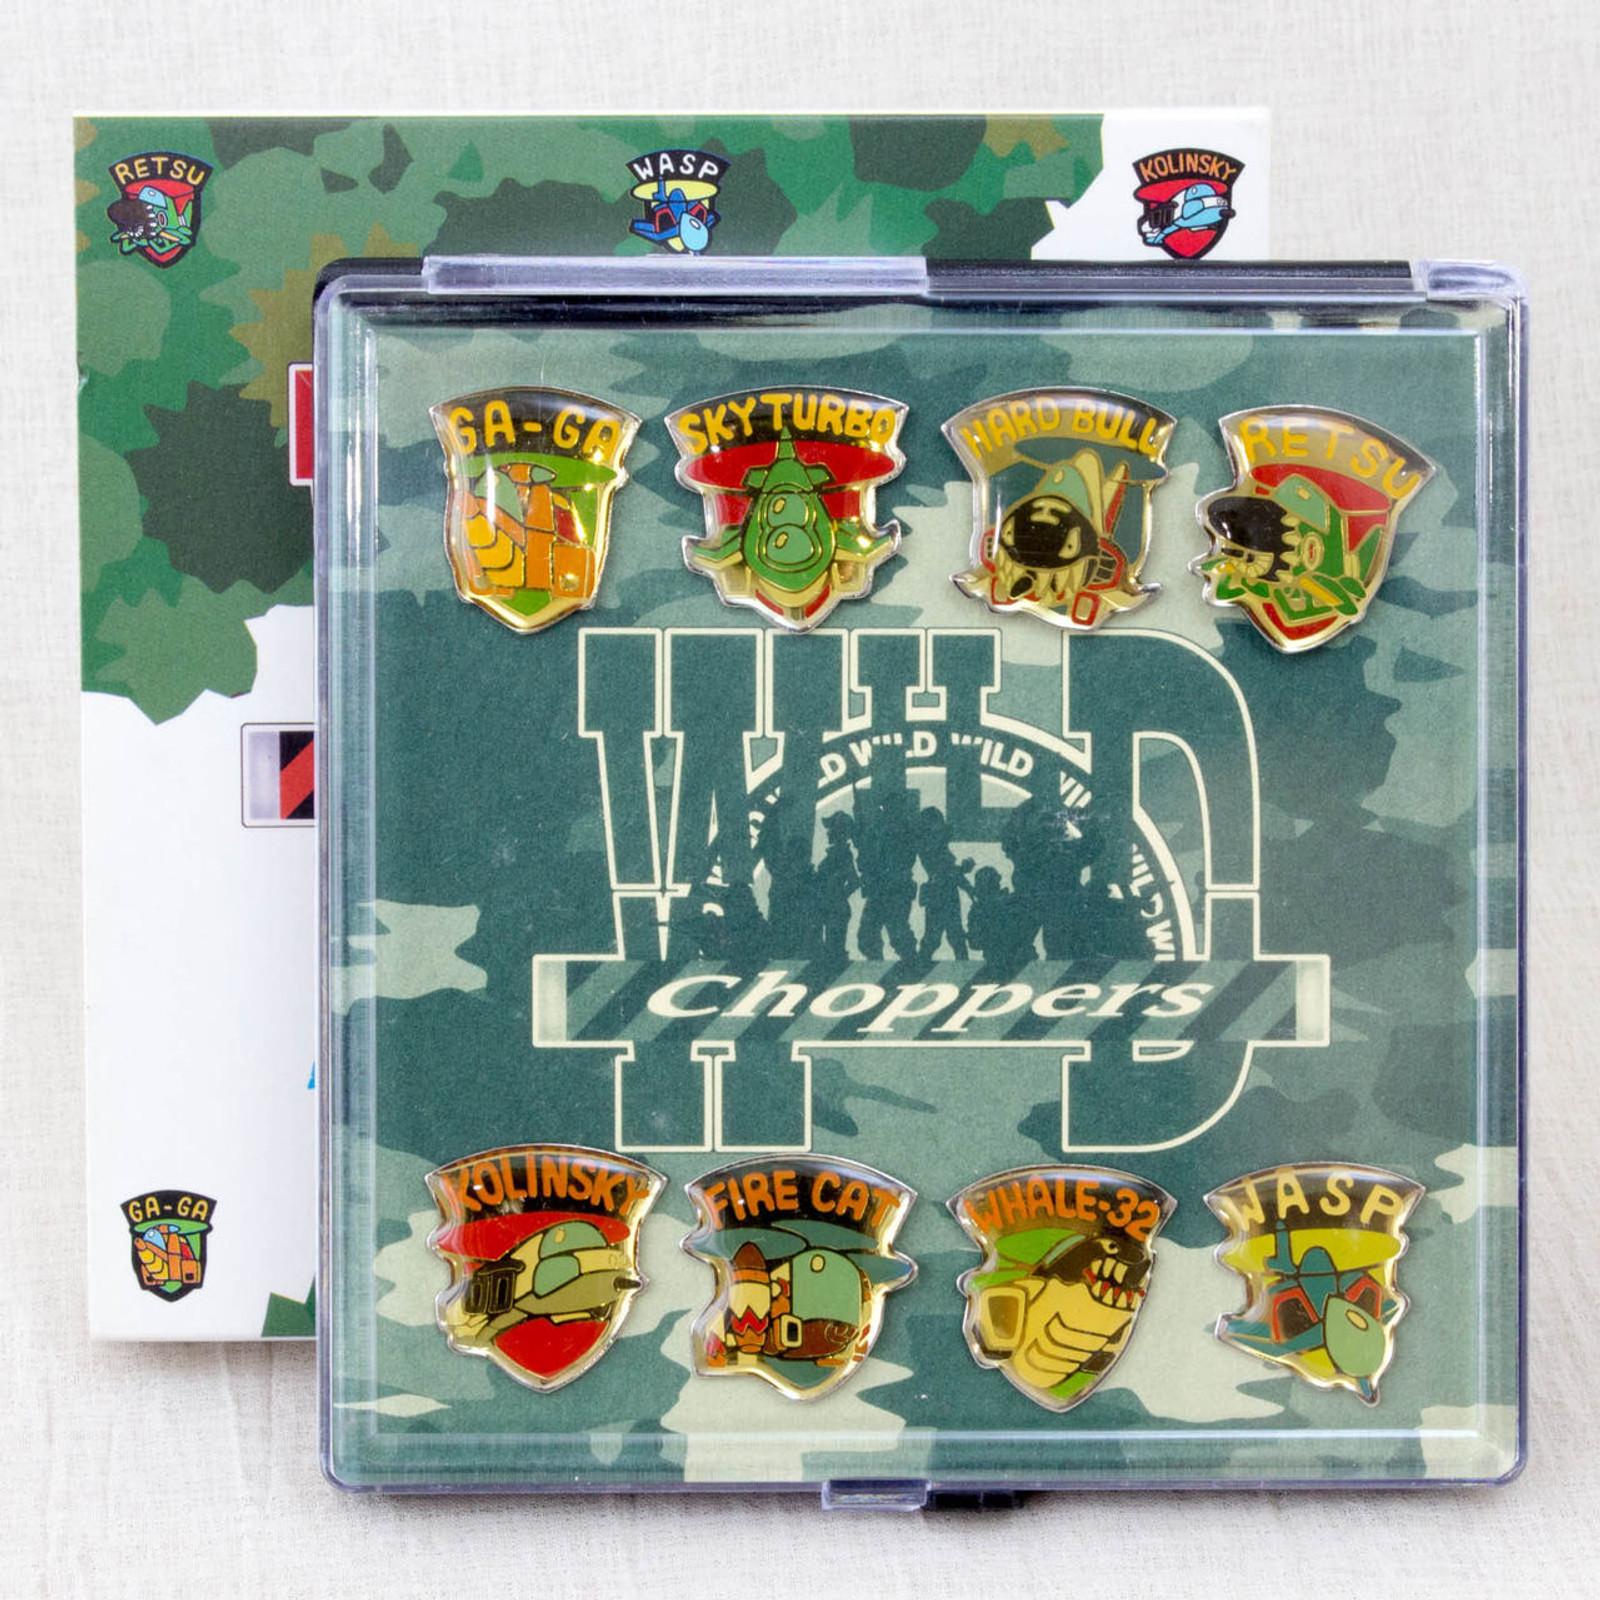 RARE! Wild Choppers Be Wild Man Pins 8pc set Seta 1997 Nintendo 64 GAME